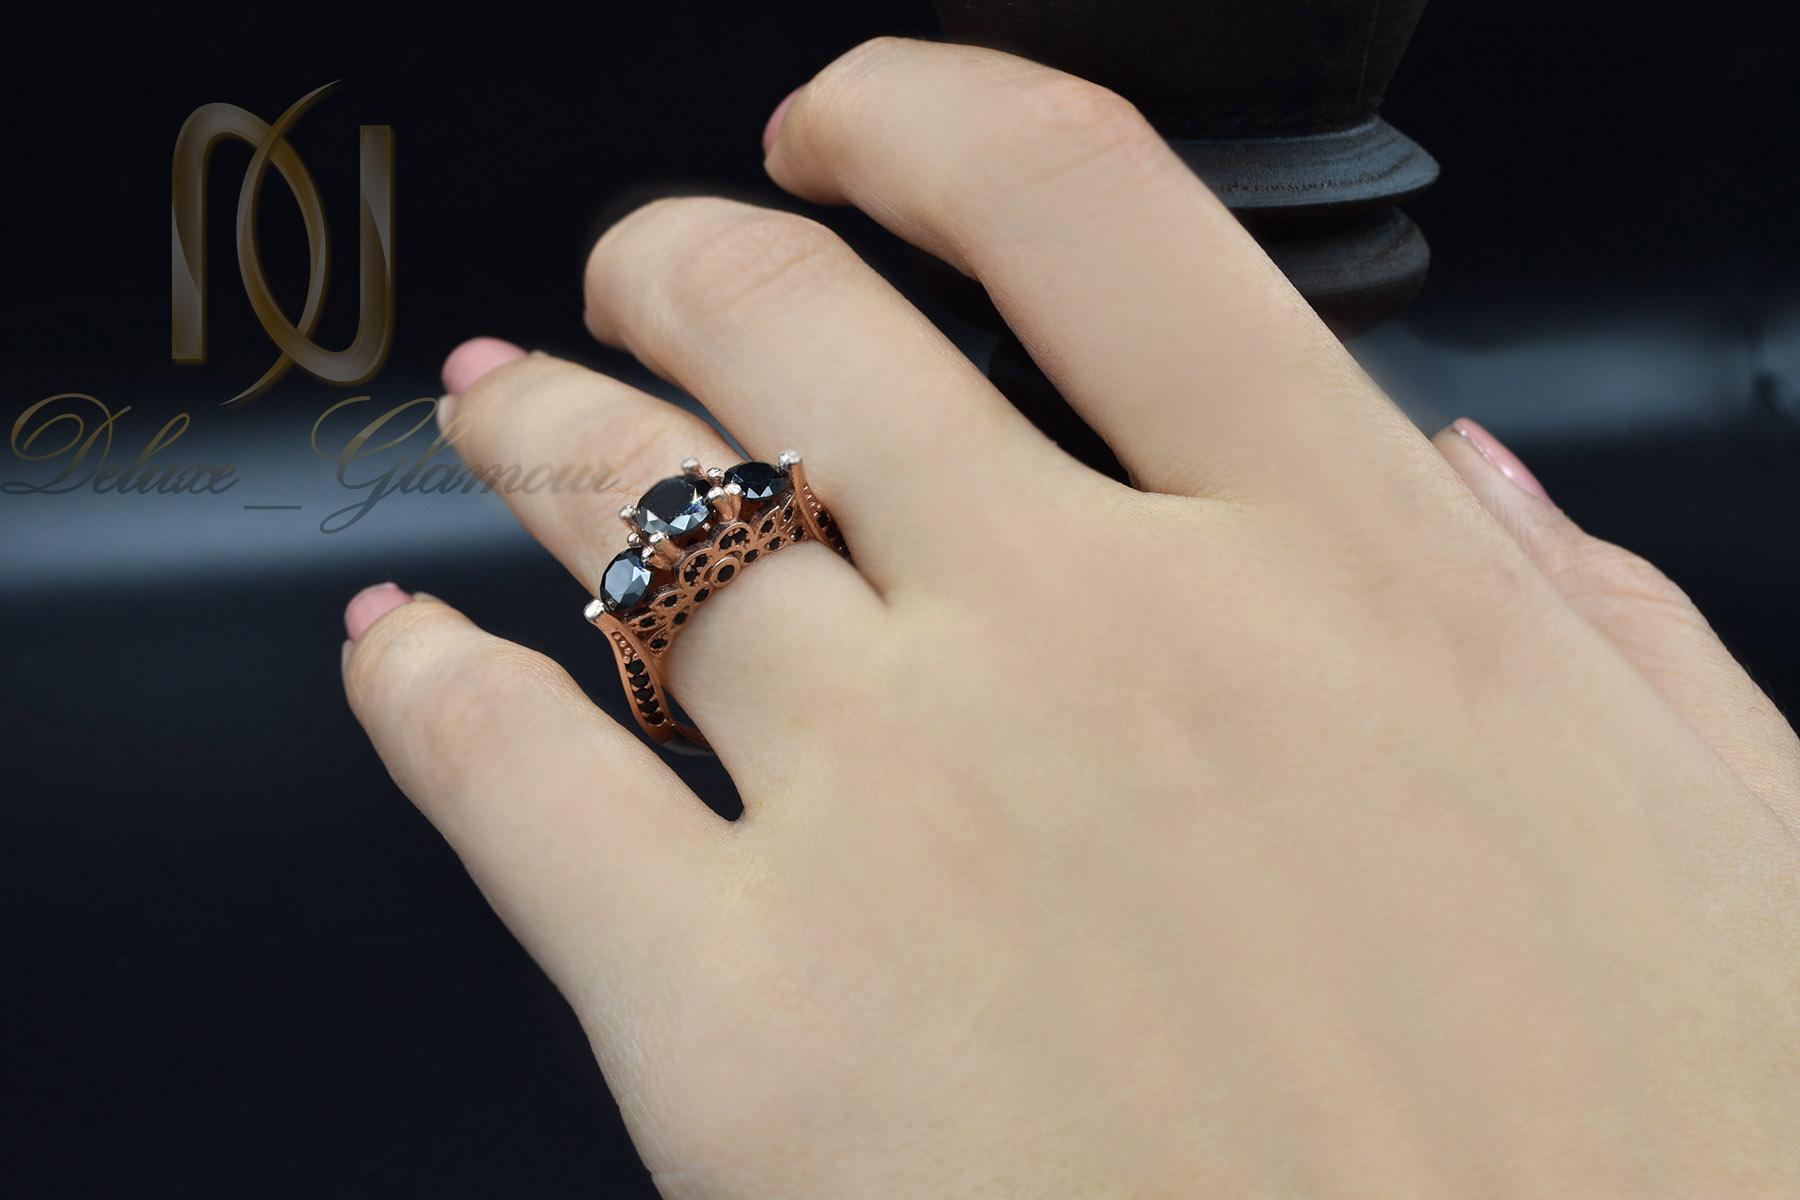 انگشتر نقره دخترانه رزگلد سه نگینه rg-n313